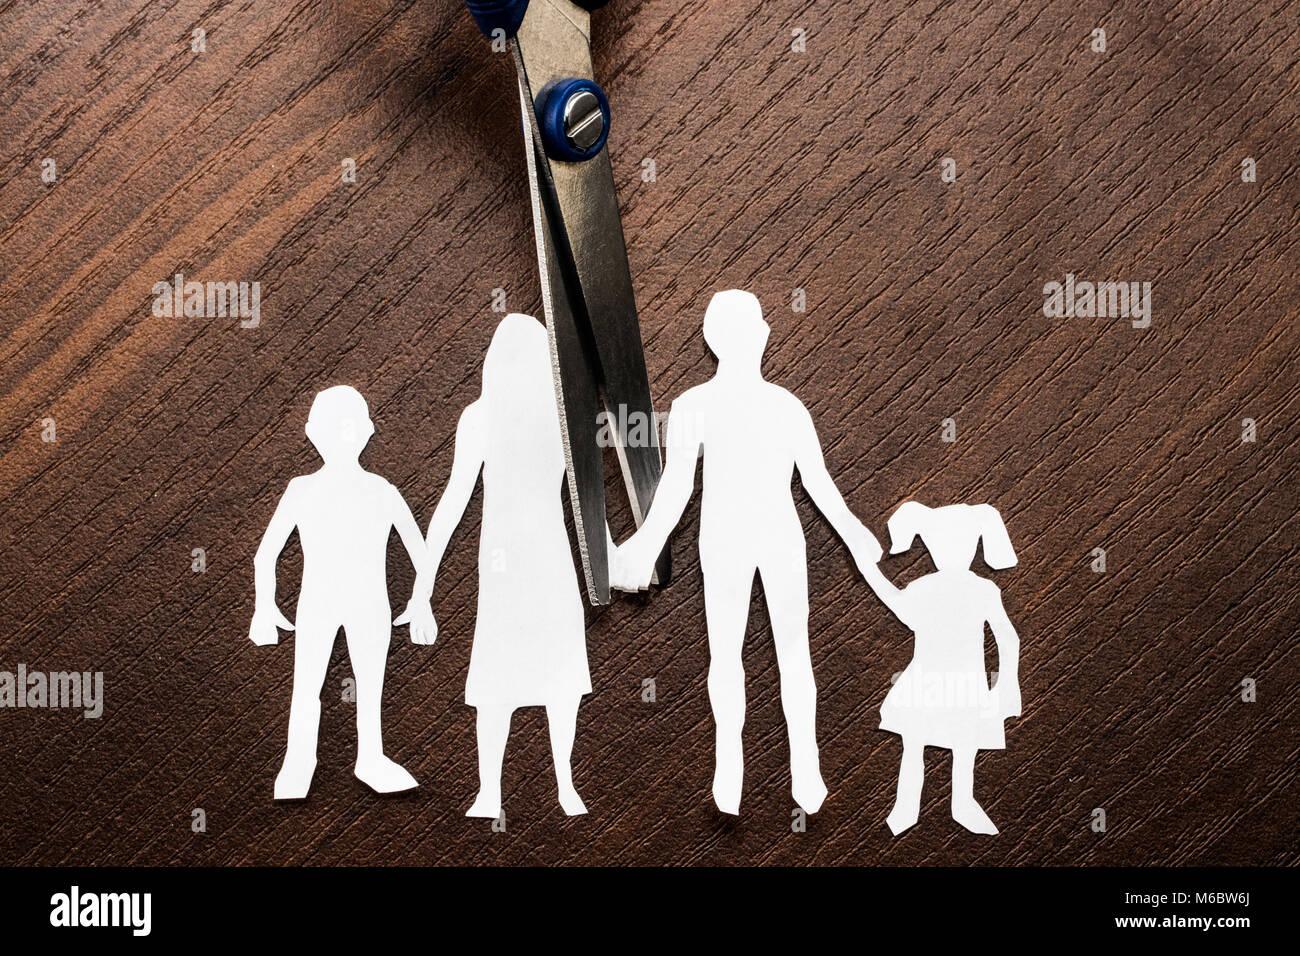 Divorce and child custody scissors cutting family apart. - Stock Image